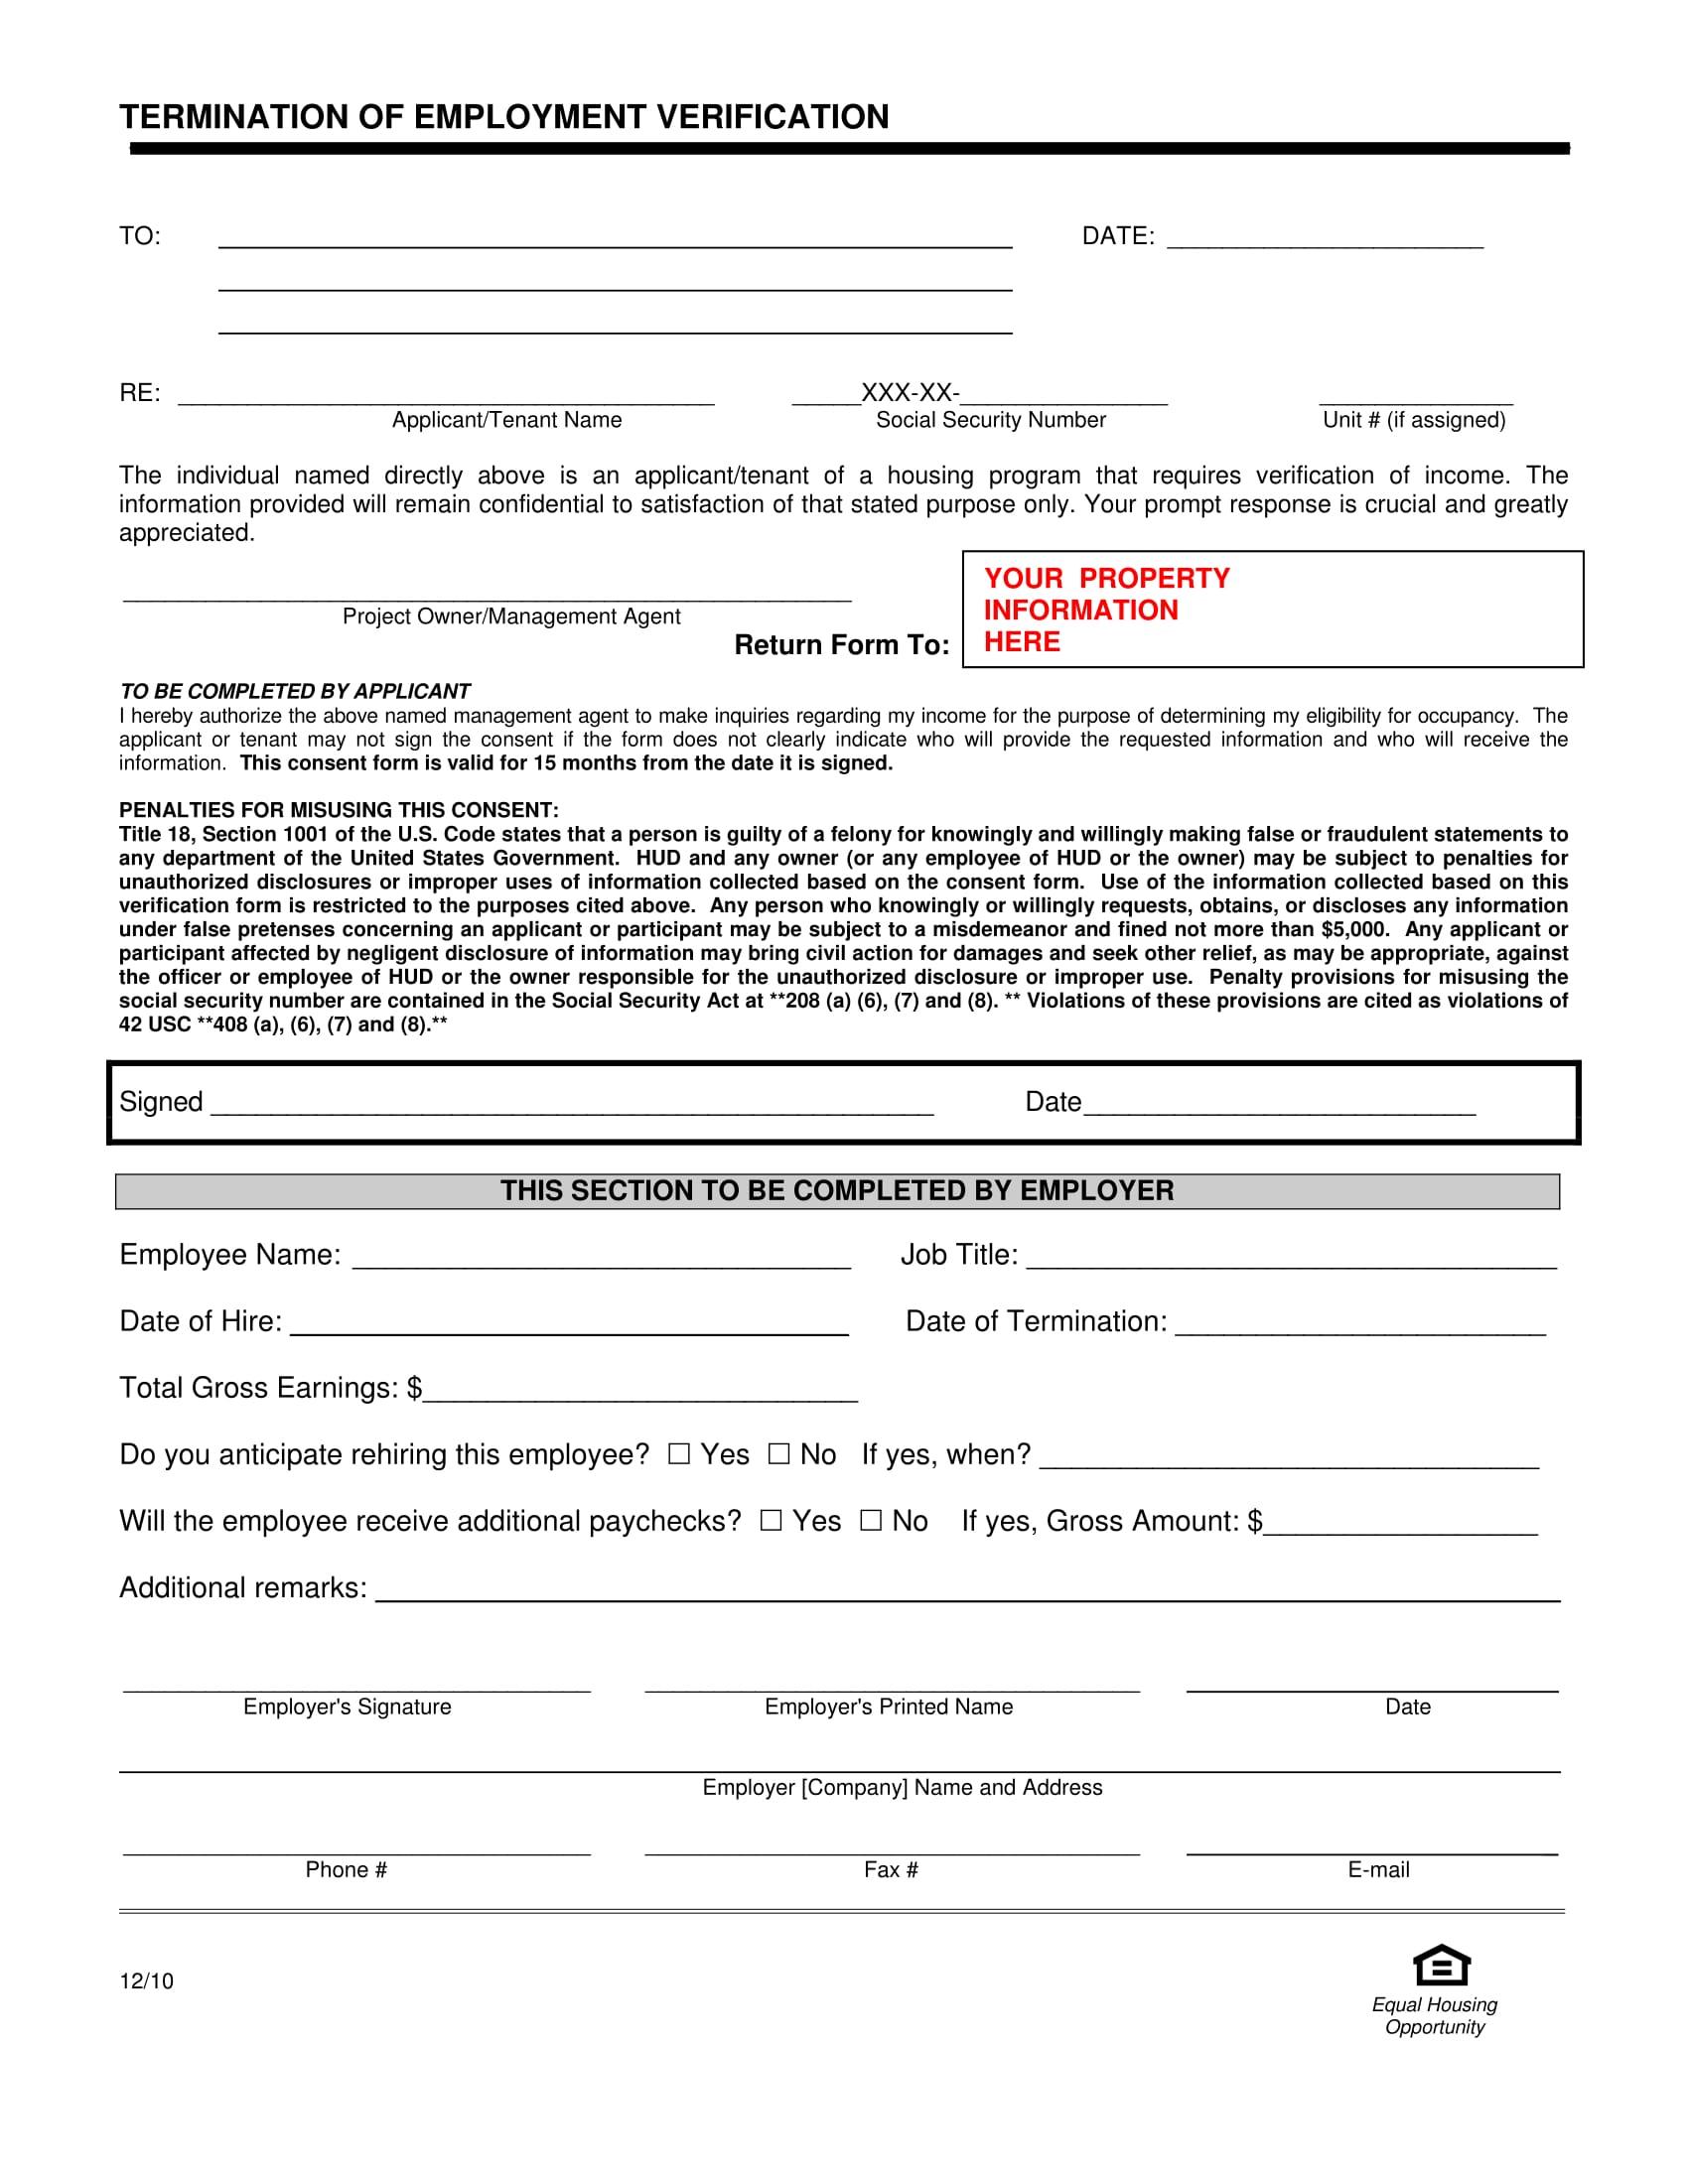 Separation Certificate Template